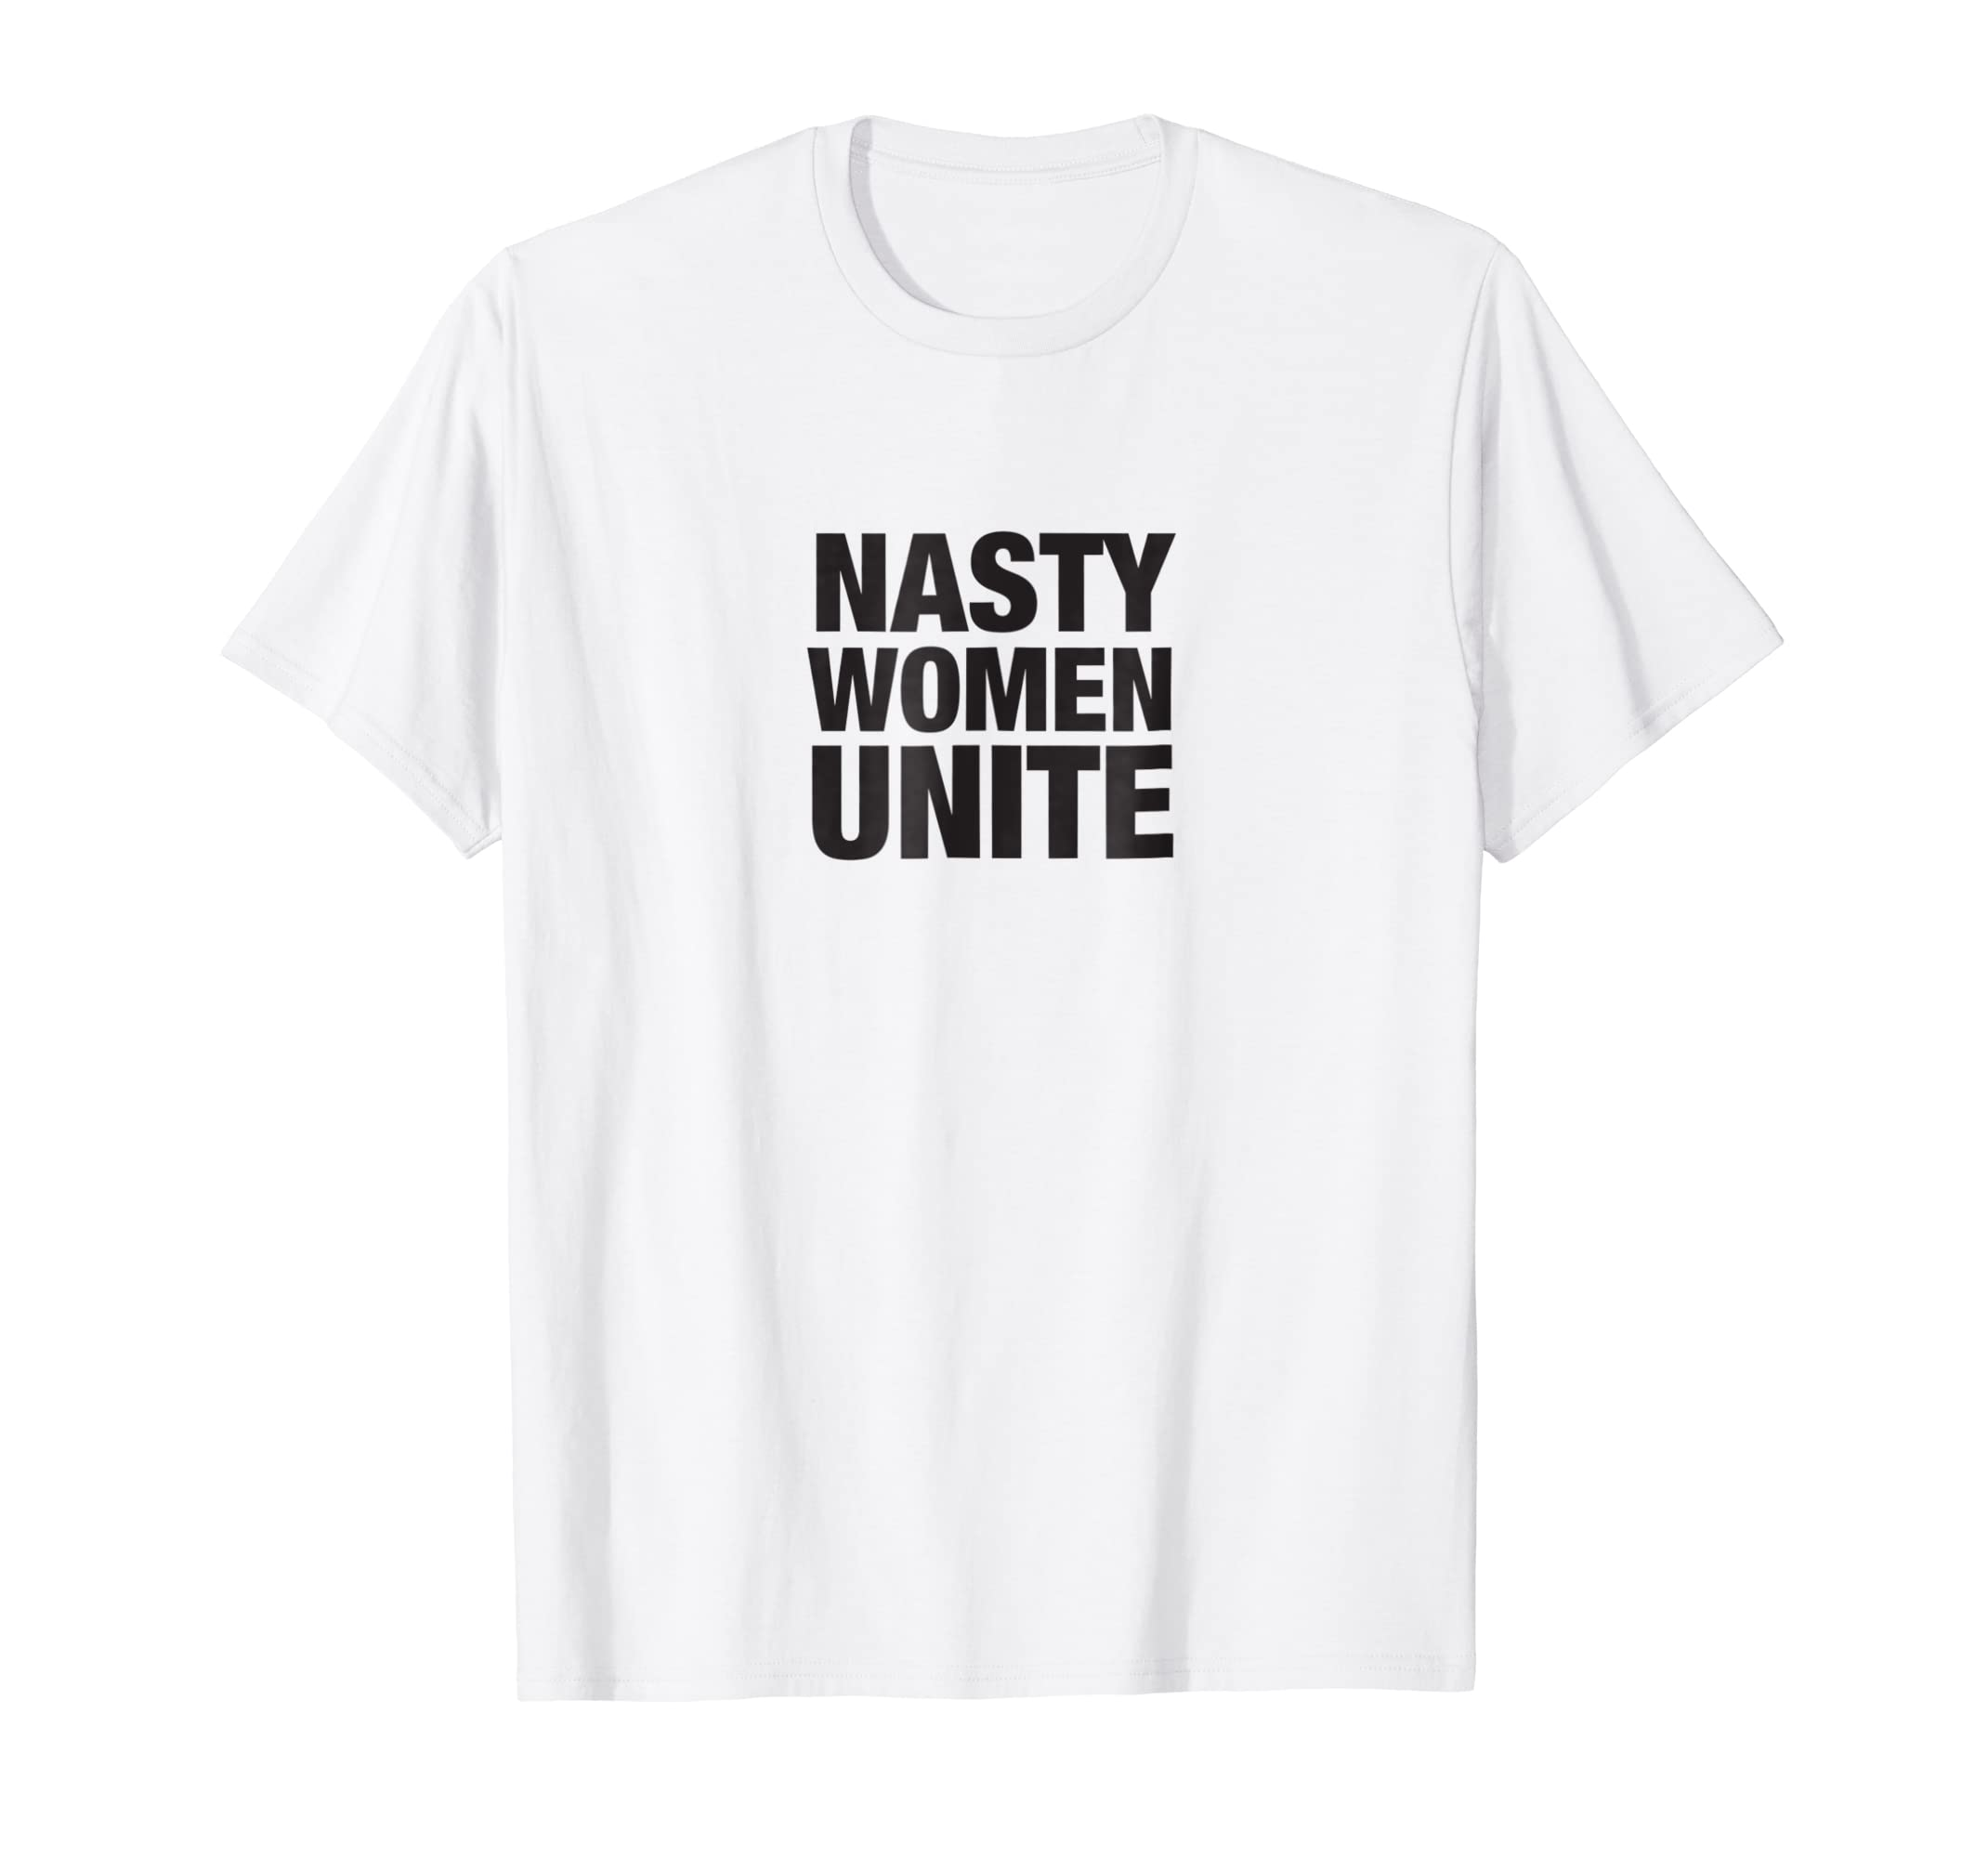 8a4db605 Amazon.com: Nasty Women Unite. T shirt: Clothing